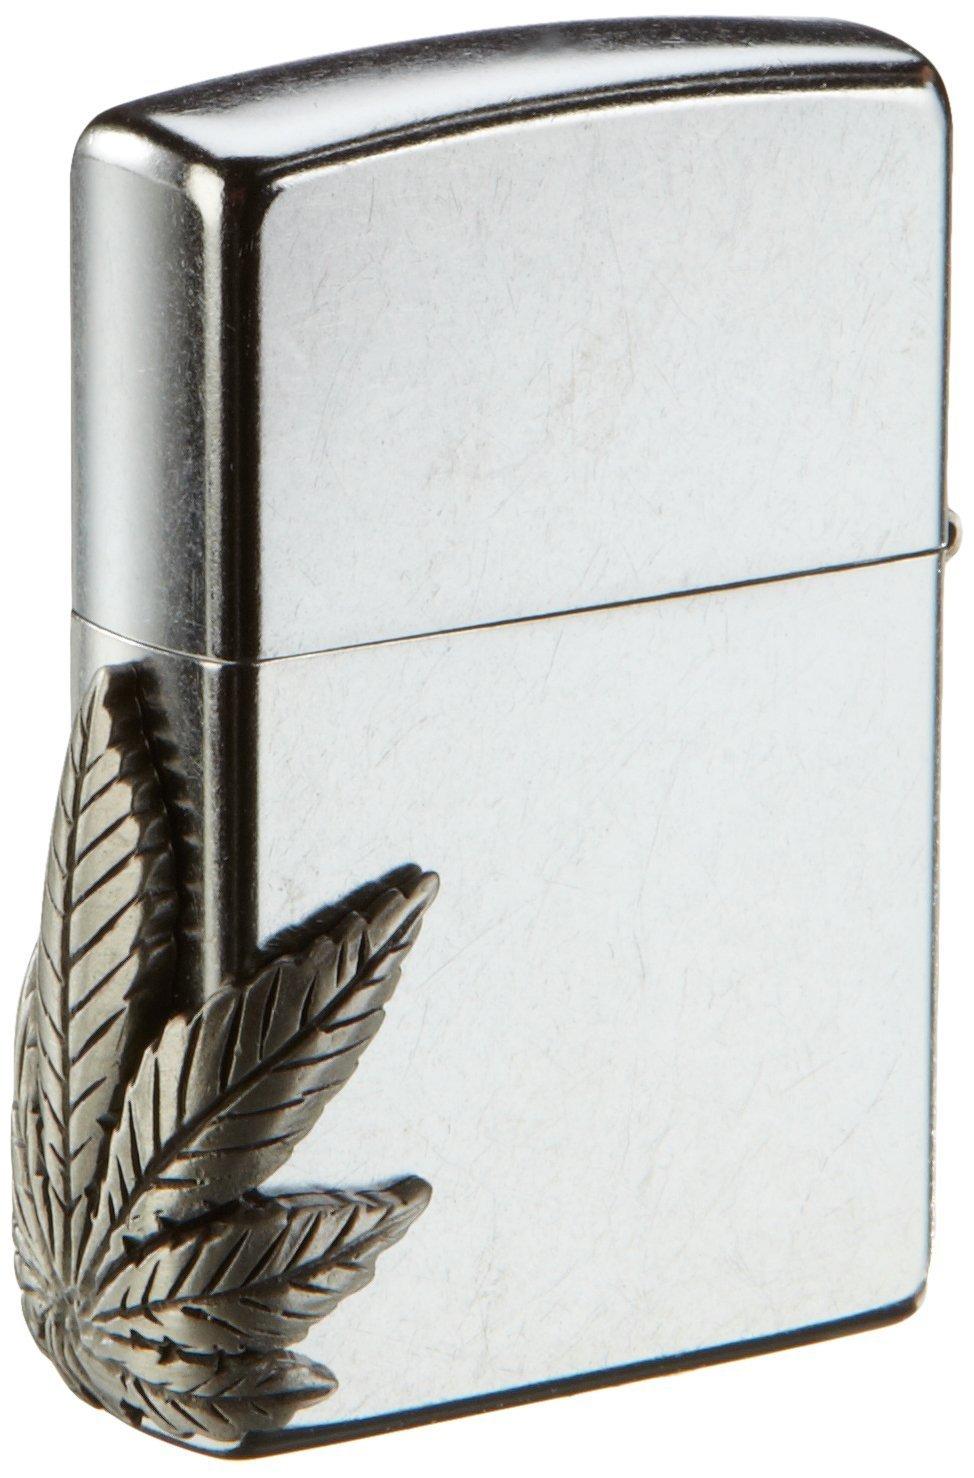 Zippo 2000561 - Mechero con relieve de marihuana en el lateral